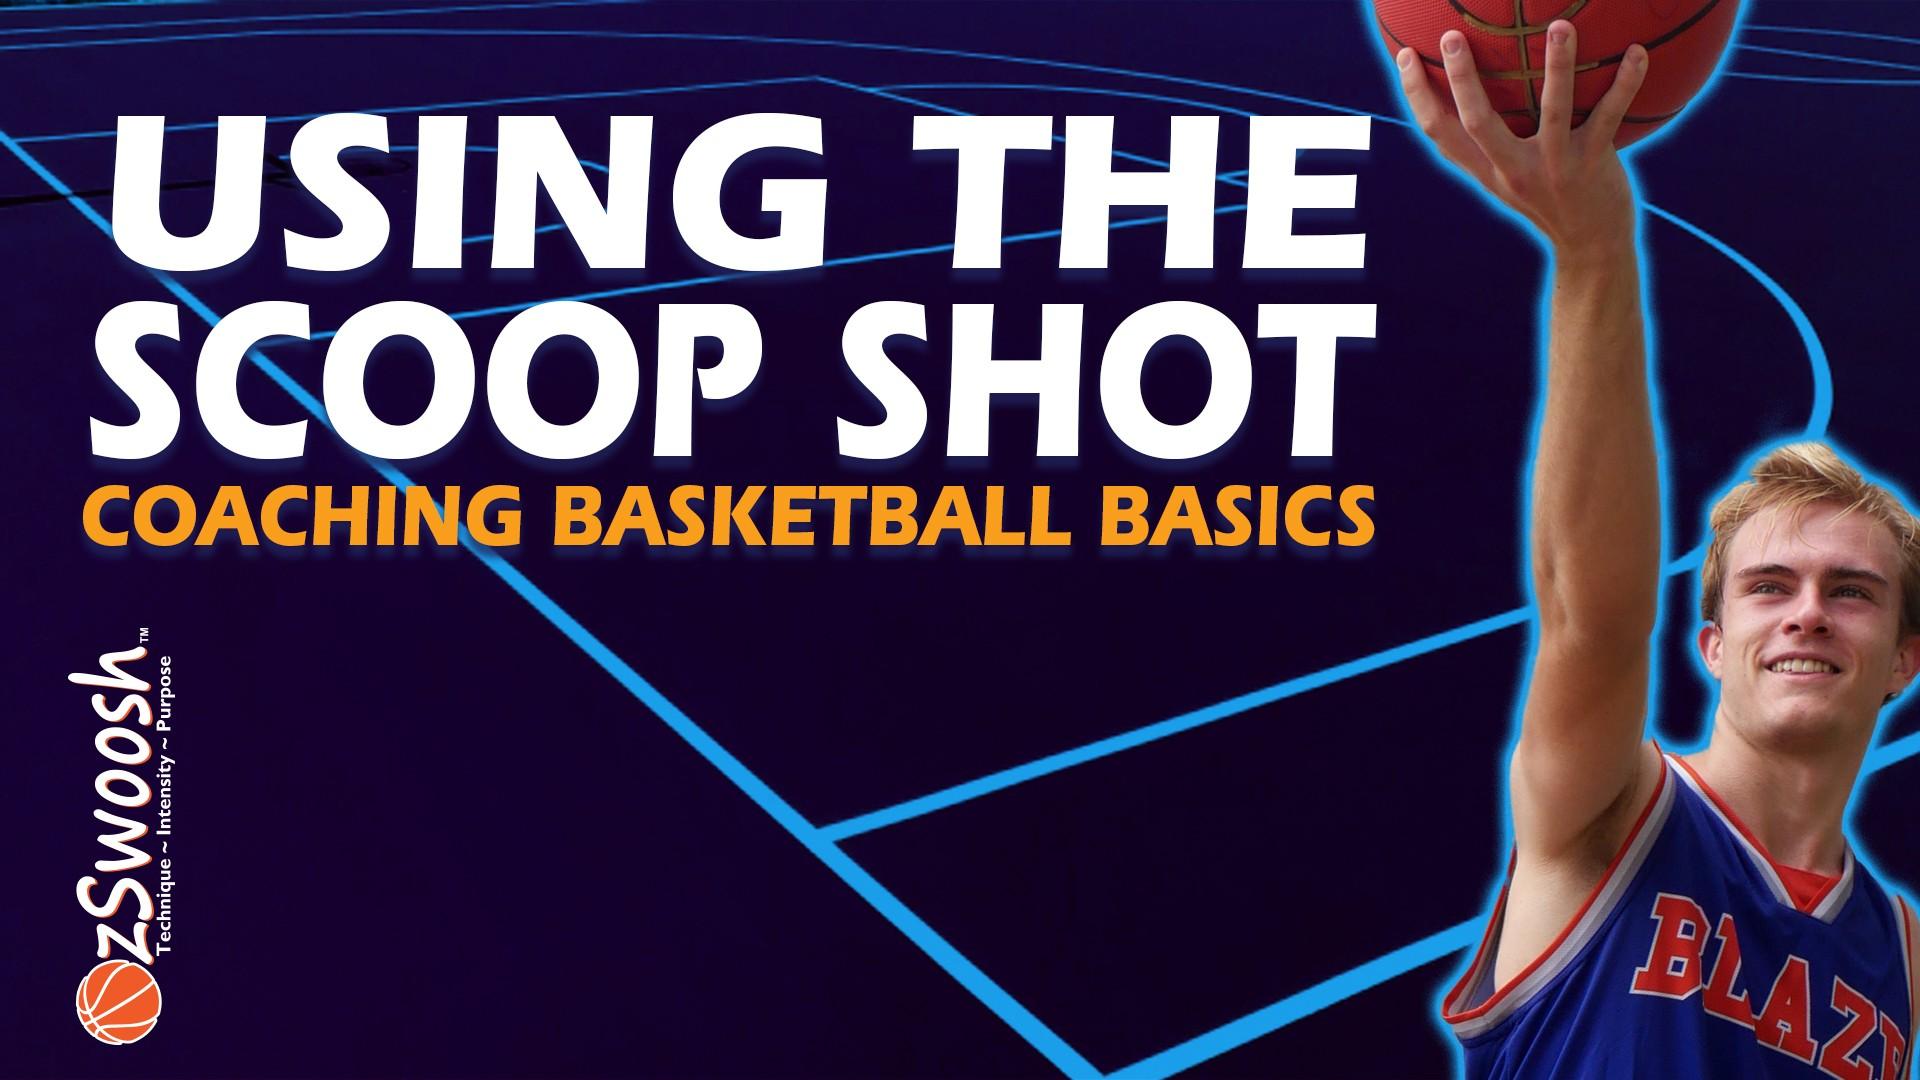 Basketball Finger Roll or Scoop Shot Technique